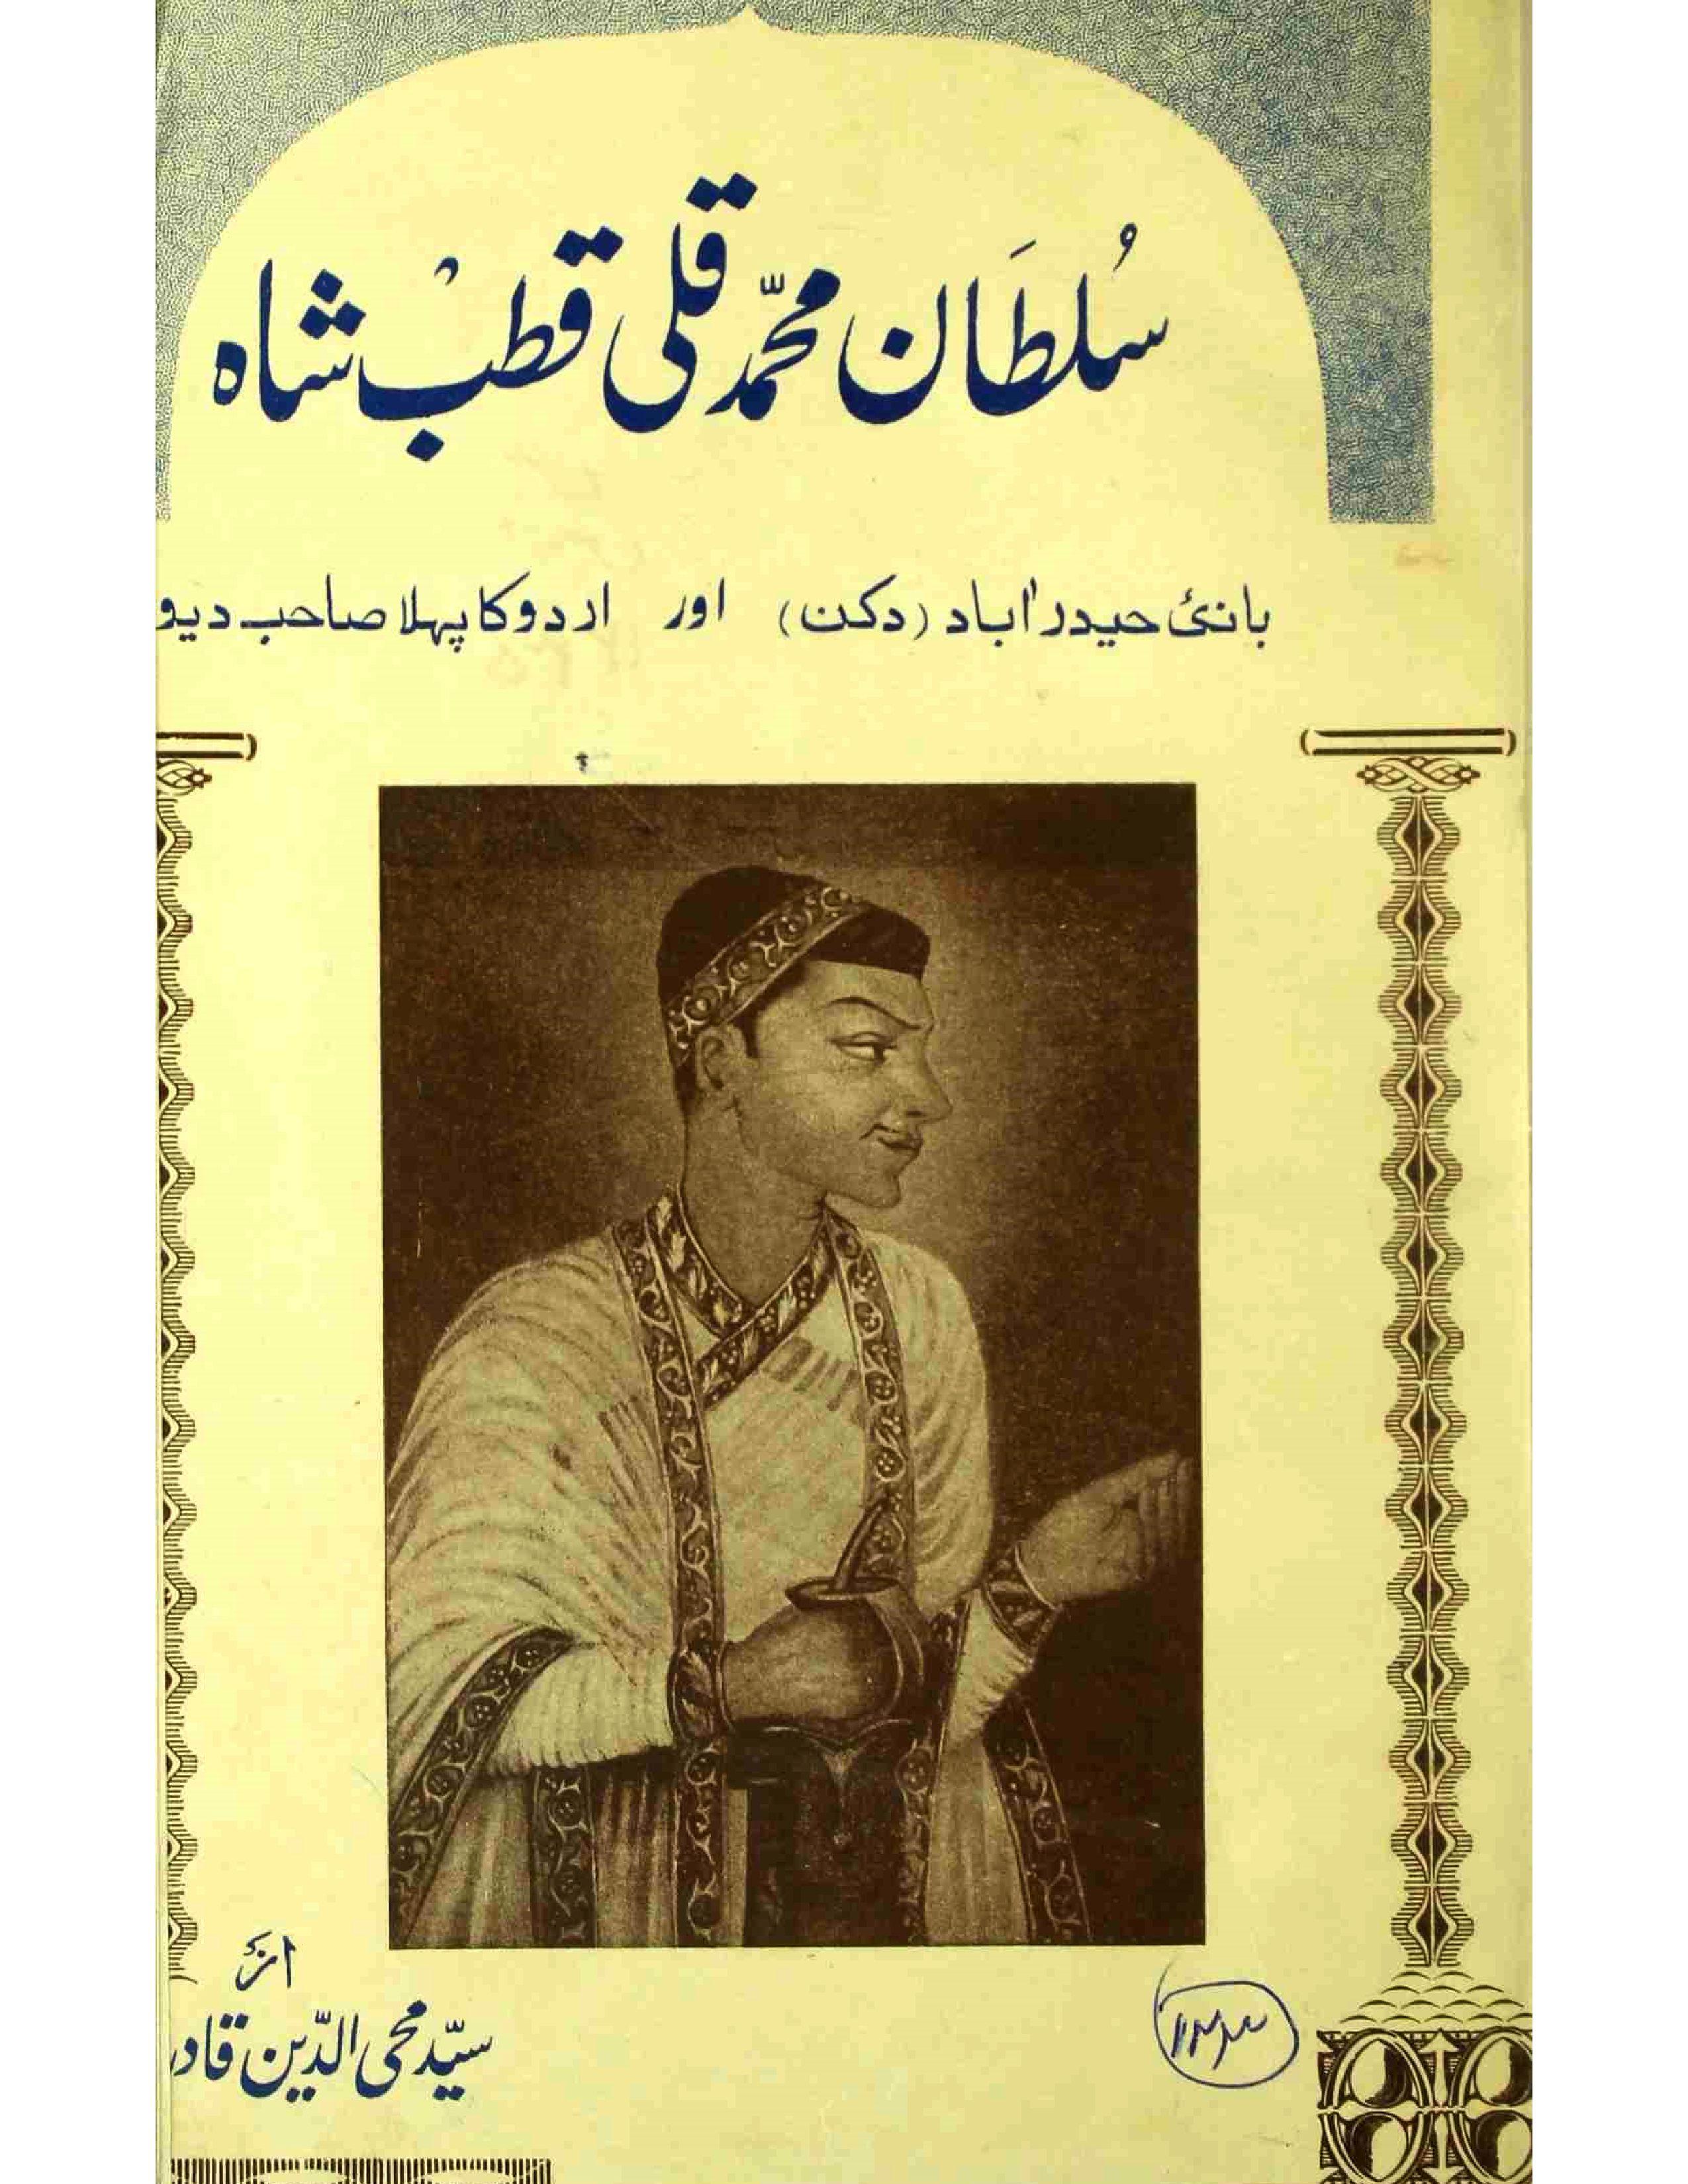 Sultan Mohammad Quli Qutub Shah